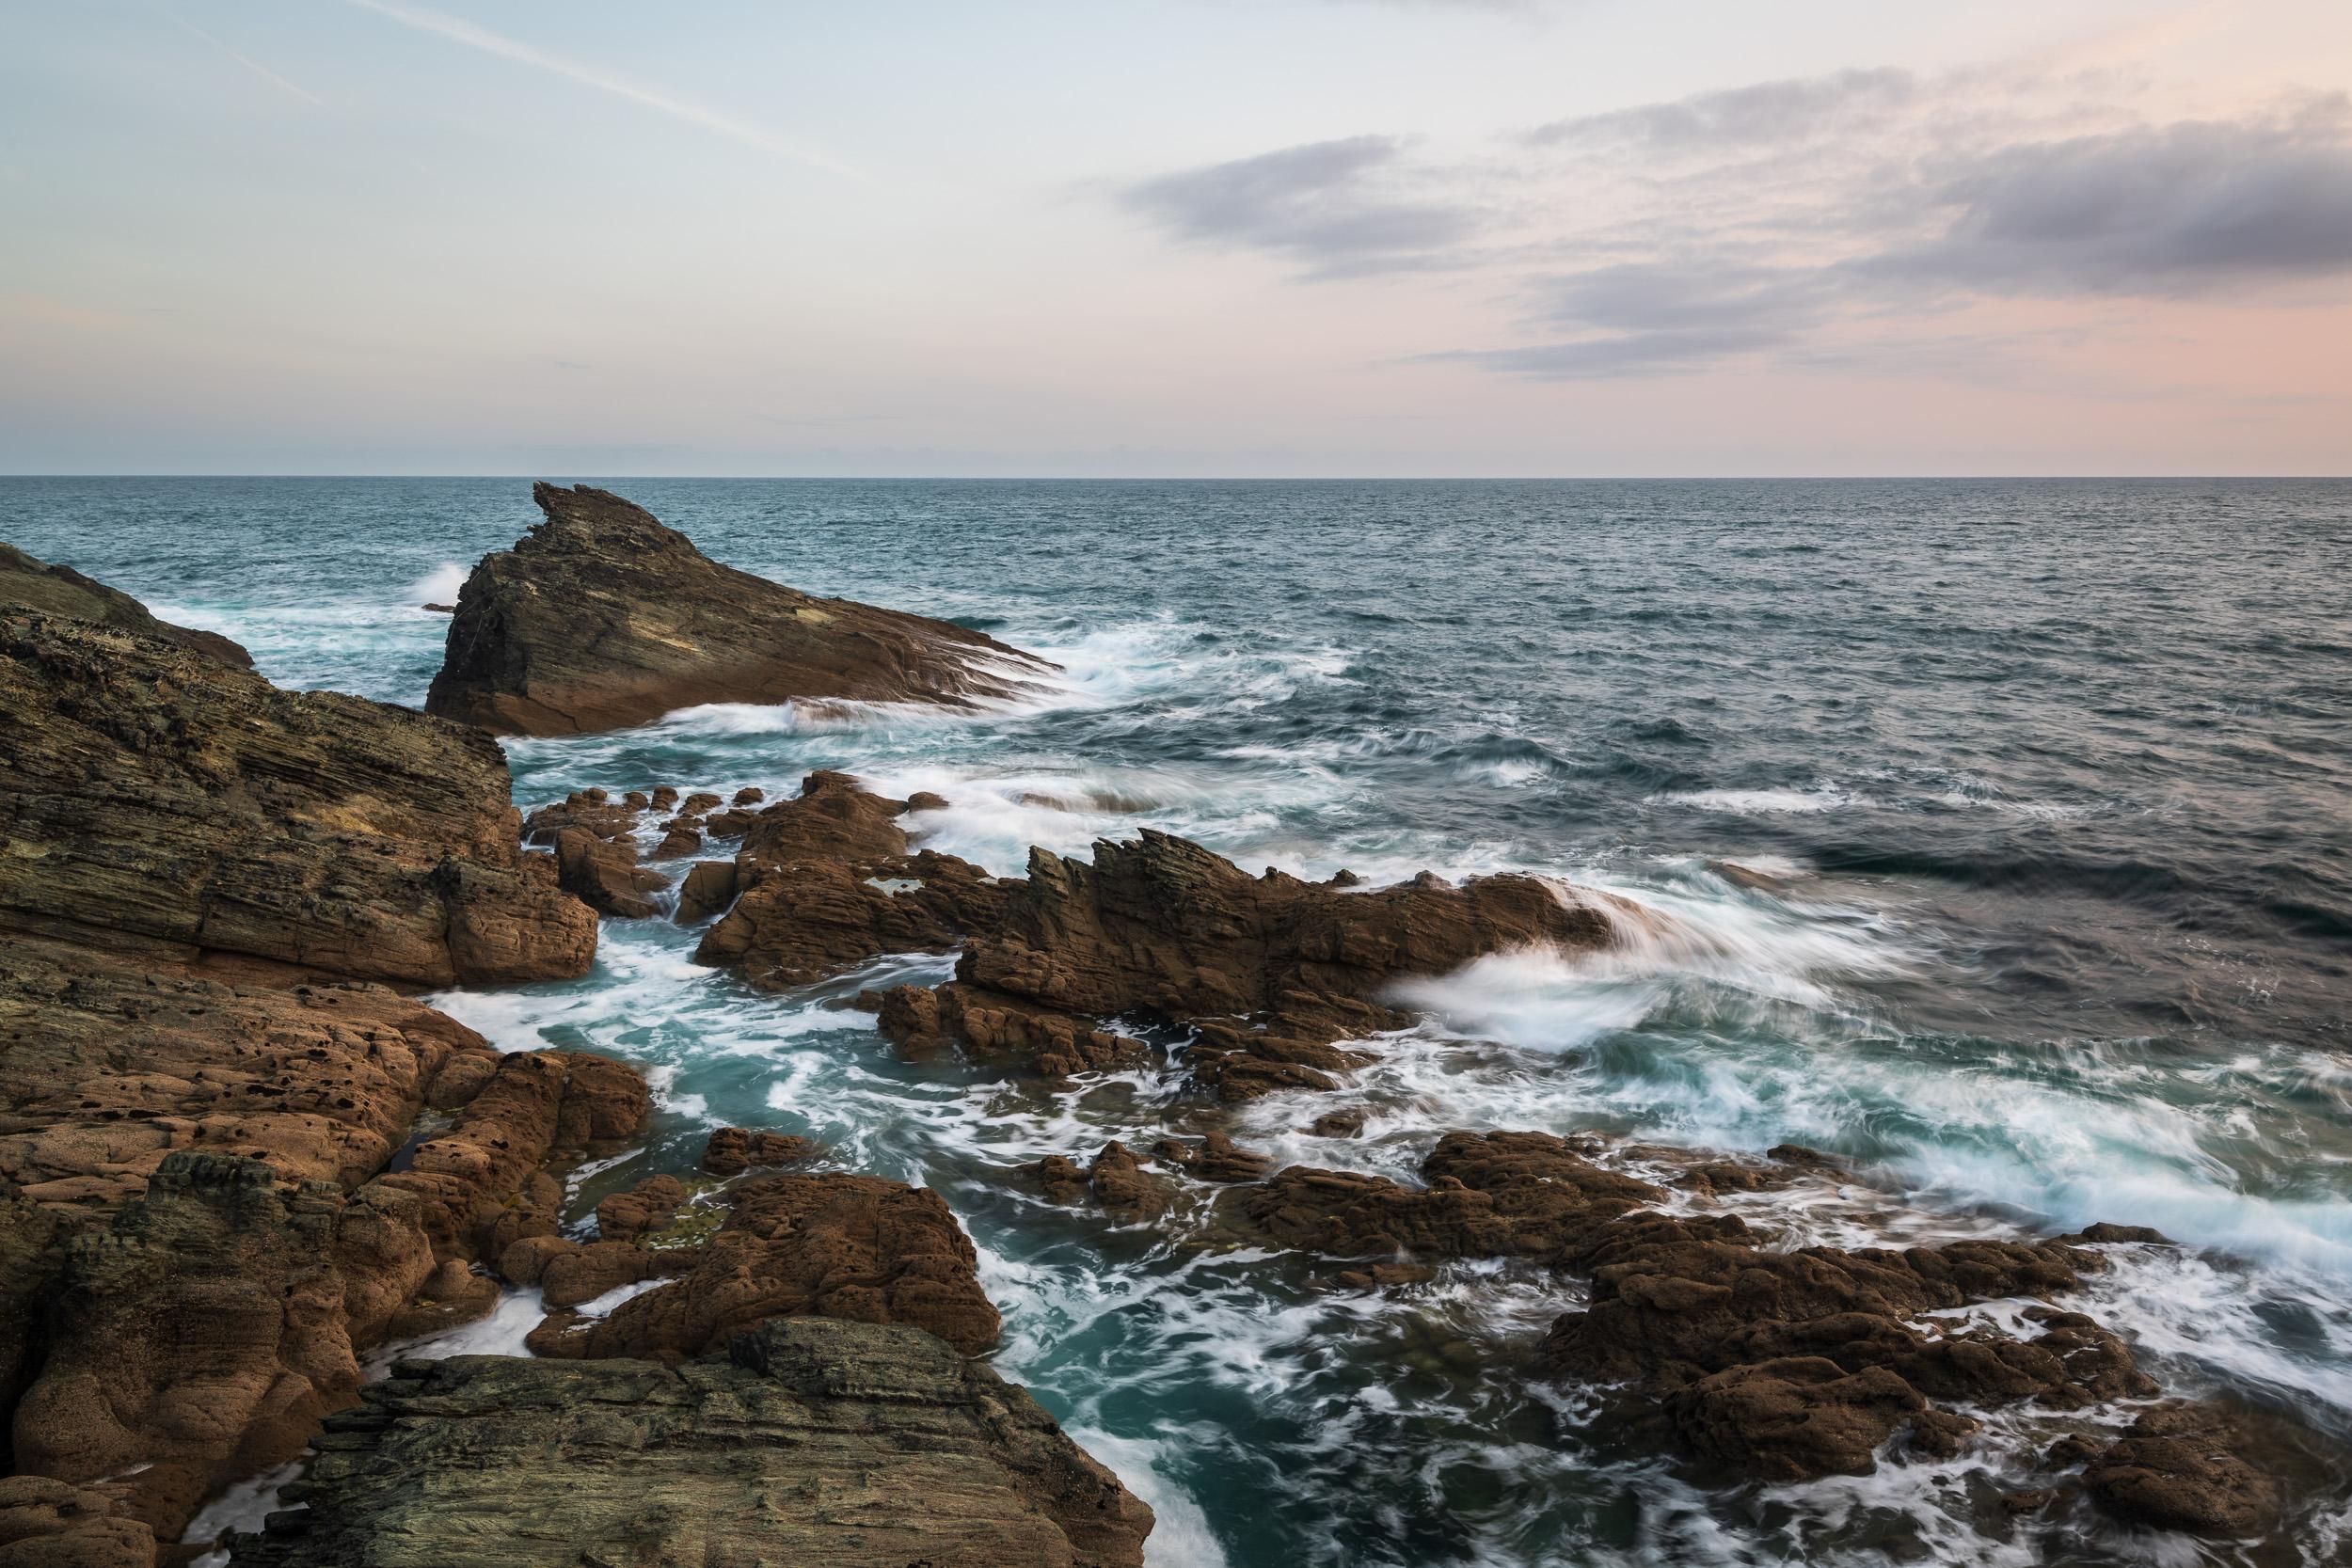 The Rocks at Gammon Head #1, Devon  - Nikon D850, Nikkor 16-35 mm f/4 at 24 mm, 0.5 seconds at ISO 64, f/13, Lee Filters Circular Polariser.